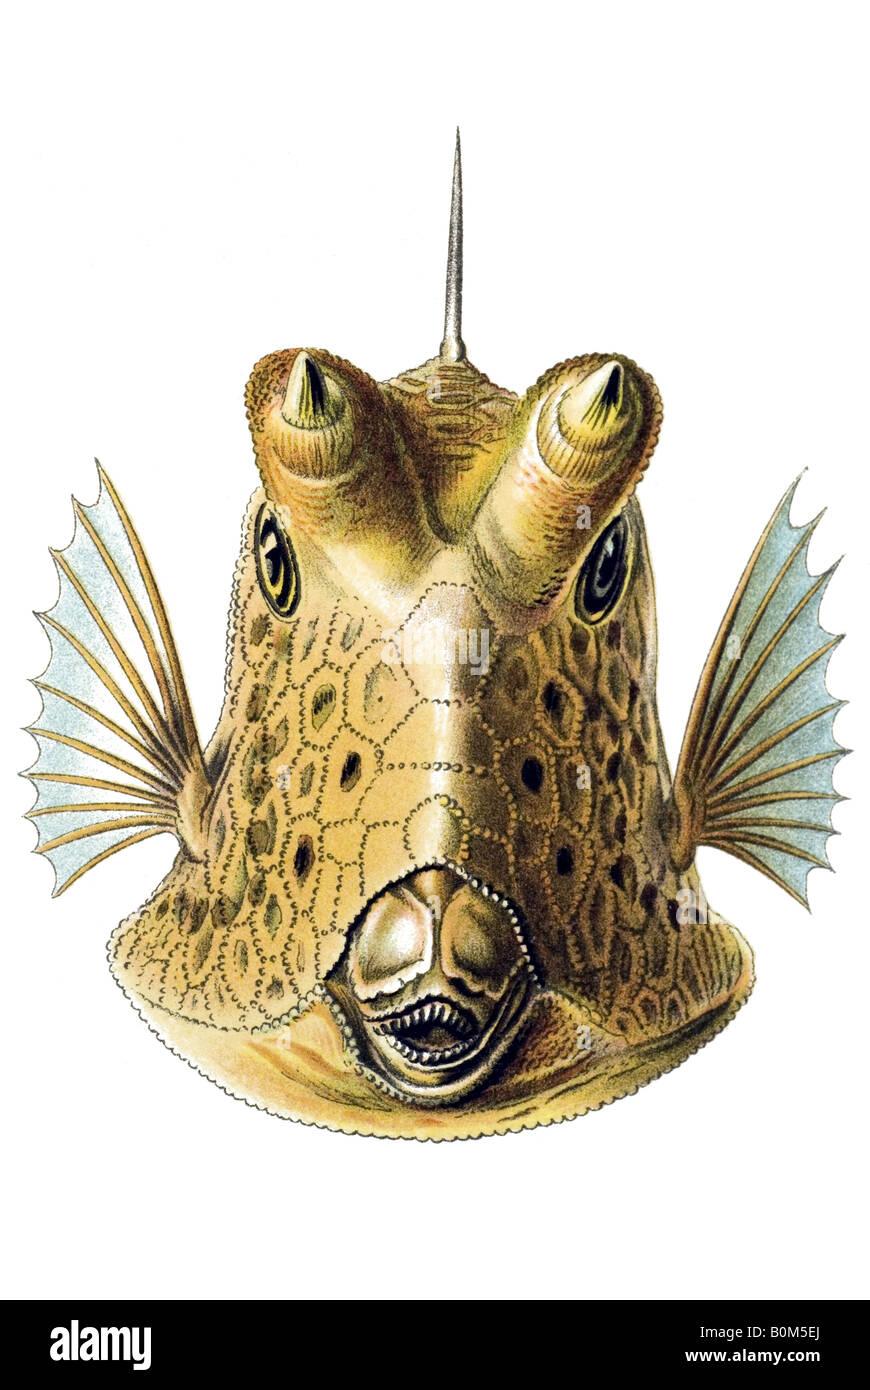 Nombre Knochenfische Ostraciontes Ostraciidae Ostracion cornatus, art nouveau, siglo XX, Europa Imagen De Stock